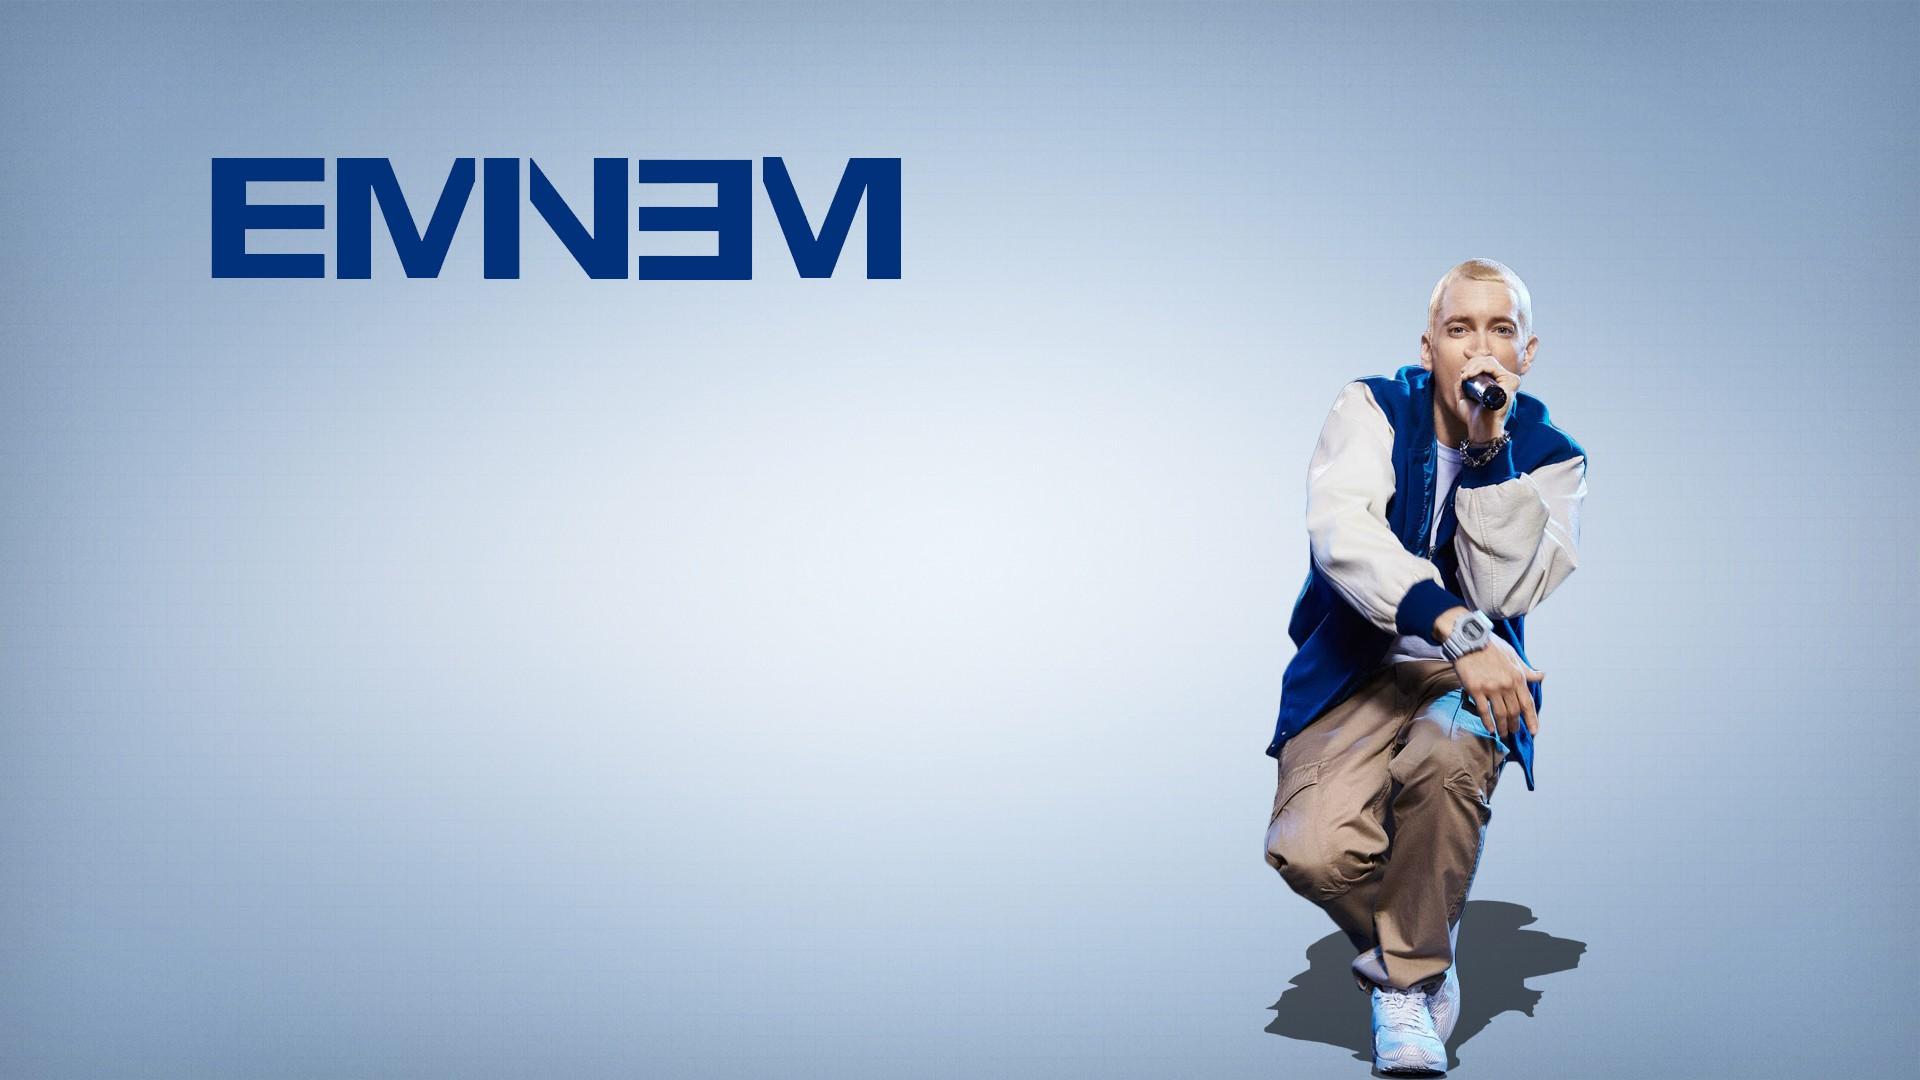 Eminem Wallpaper Download Free Cool Hd Wallpapers For Desktop